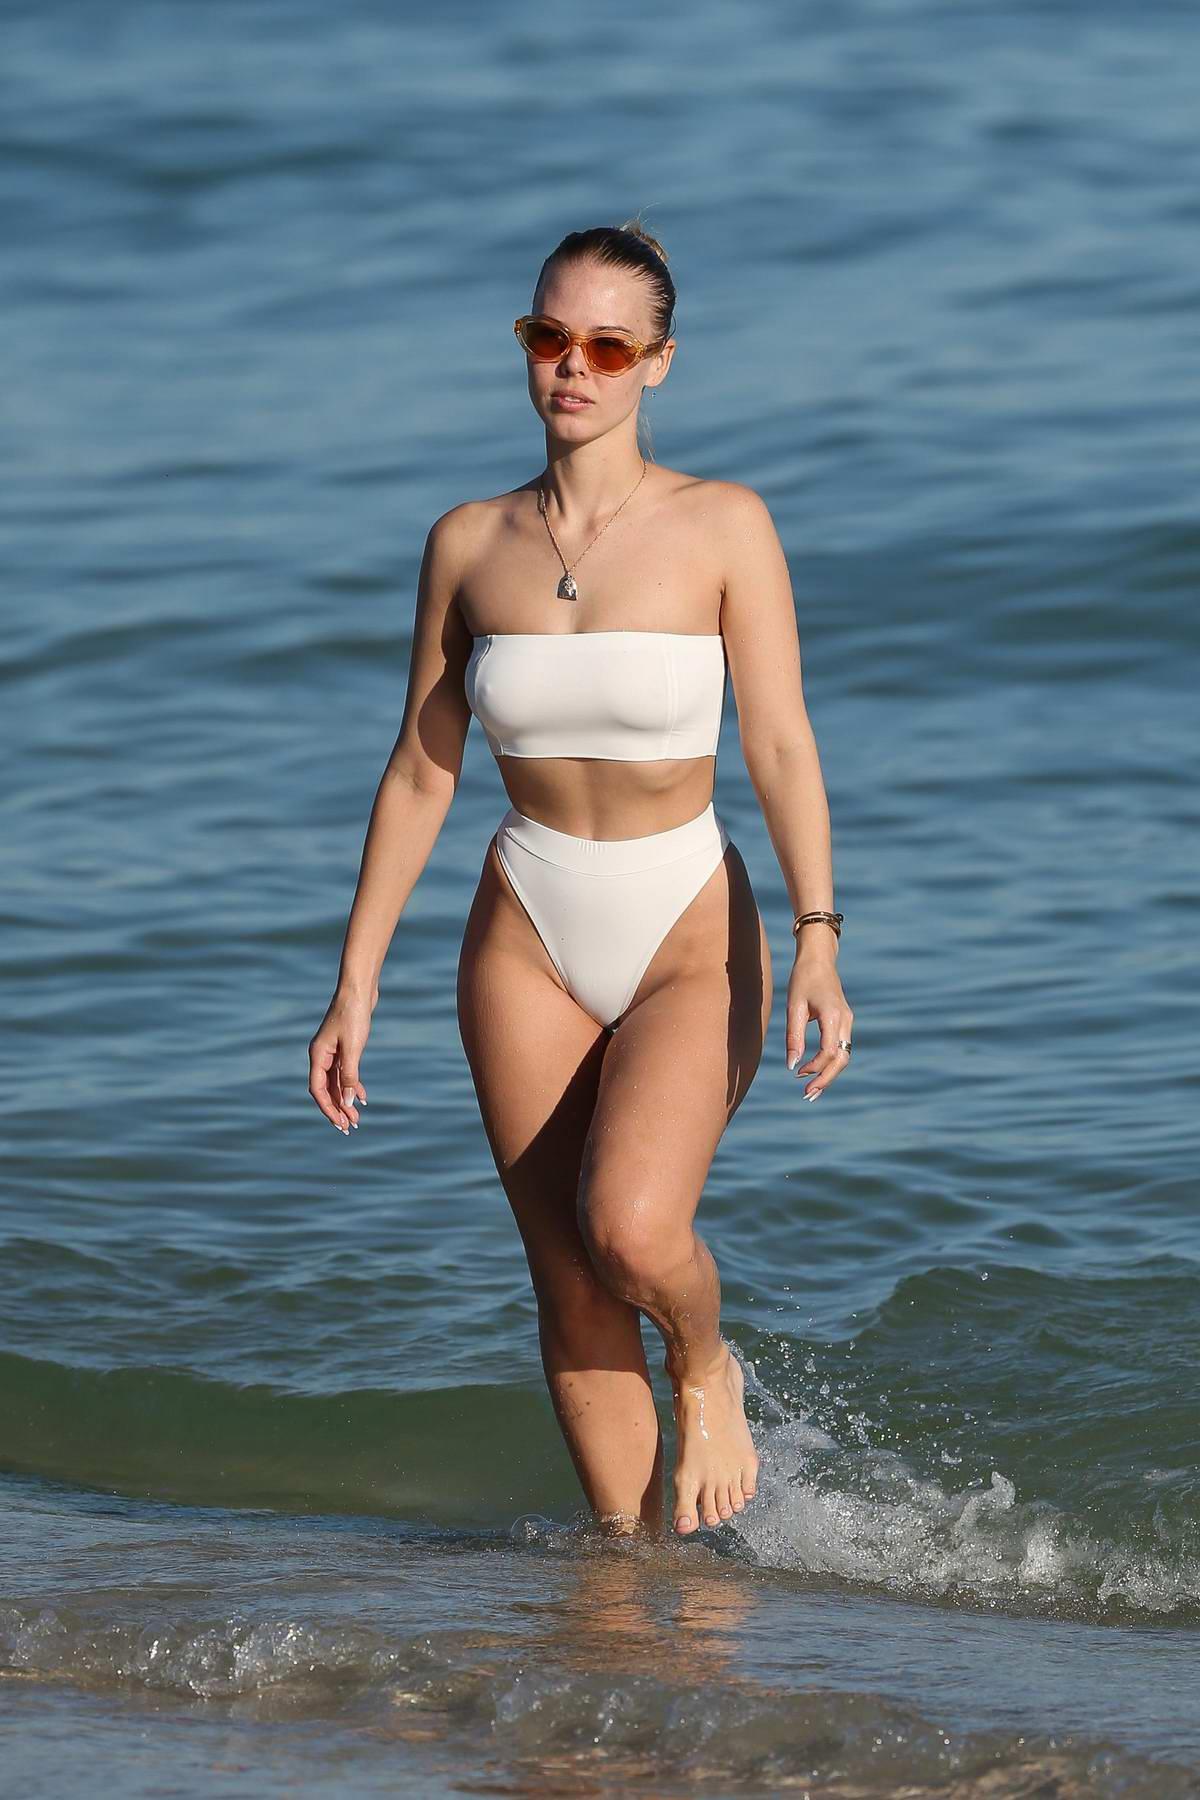 Bianca Elouise in a white bikini enjoying the beach with her boyfriend in Miami, Florida